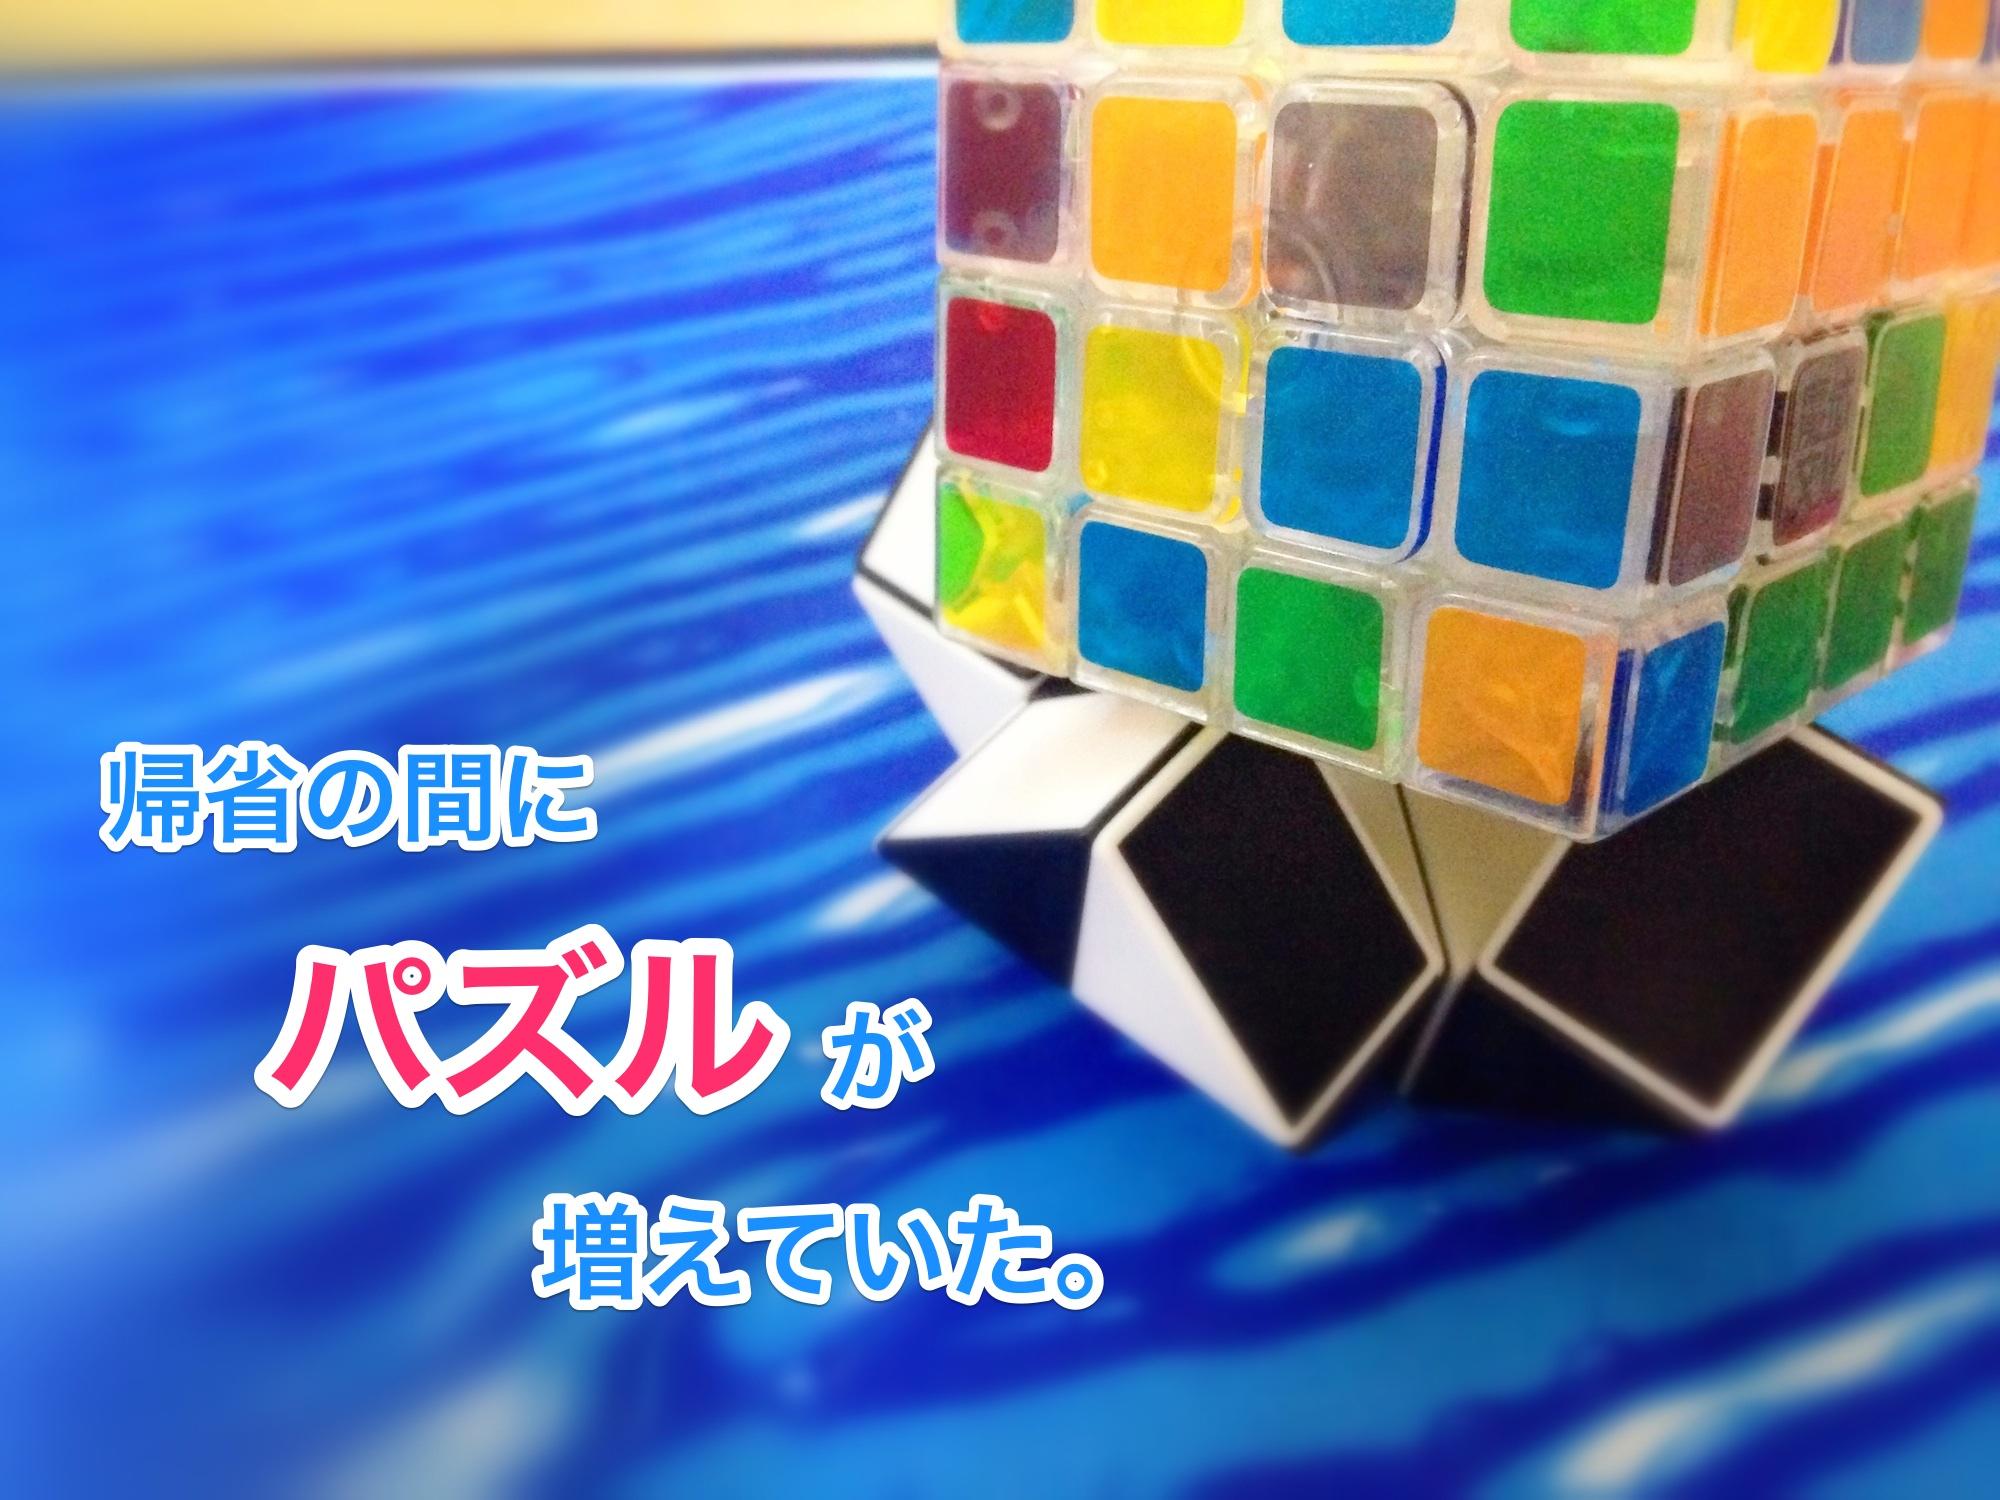 写真_2014-09-29_午前1_44_04